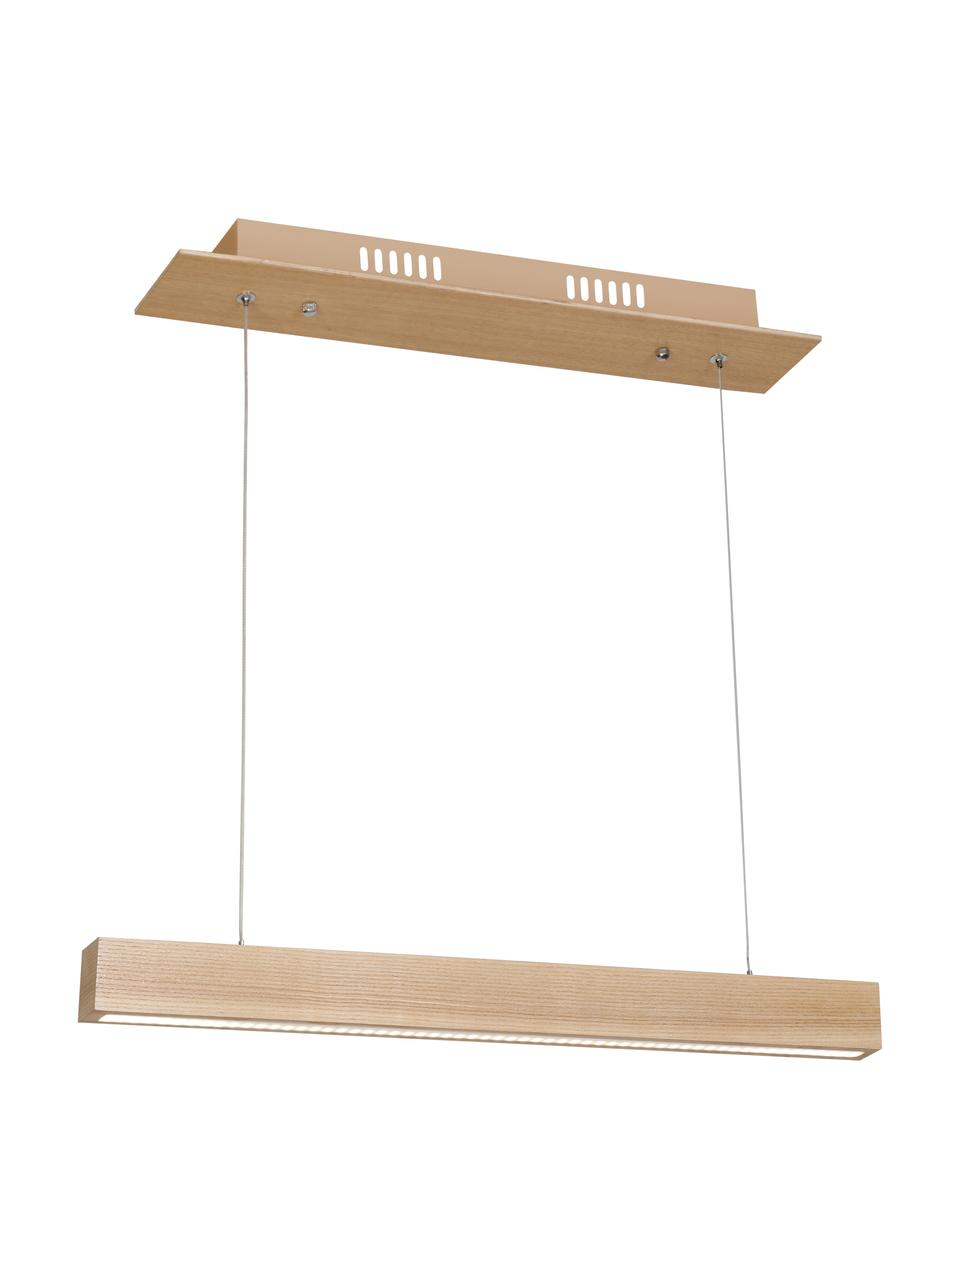 Grote LED hanglamp Timber van hout, Lampenkap: hout, Baldakijn: hout, Hout, B 94 x D 9 cm